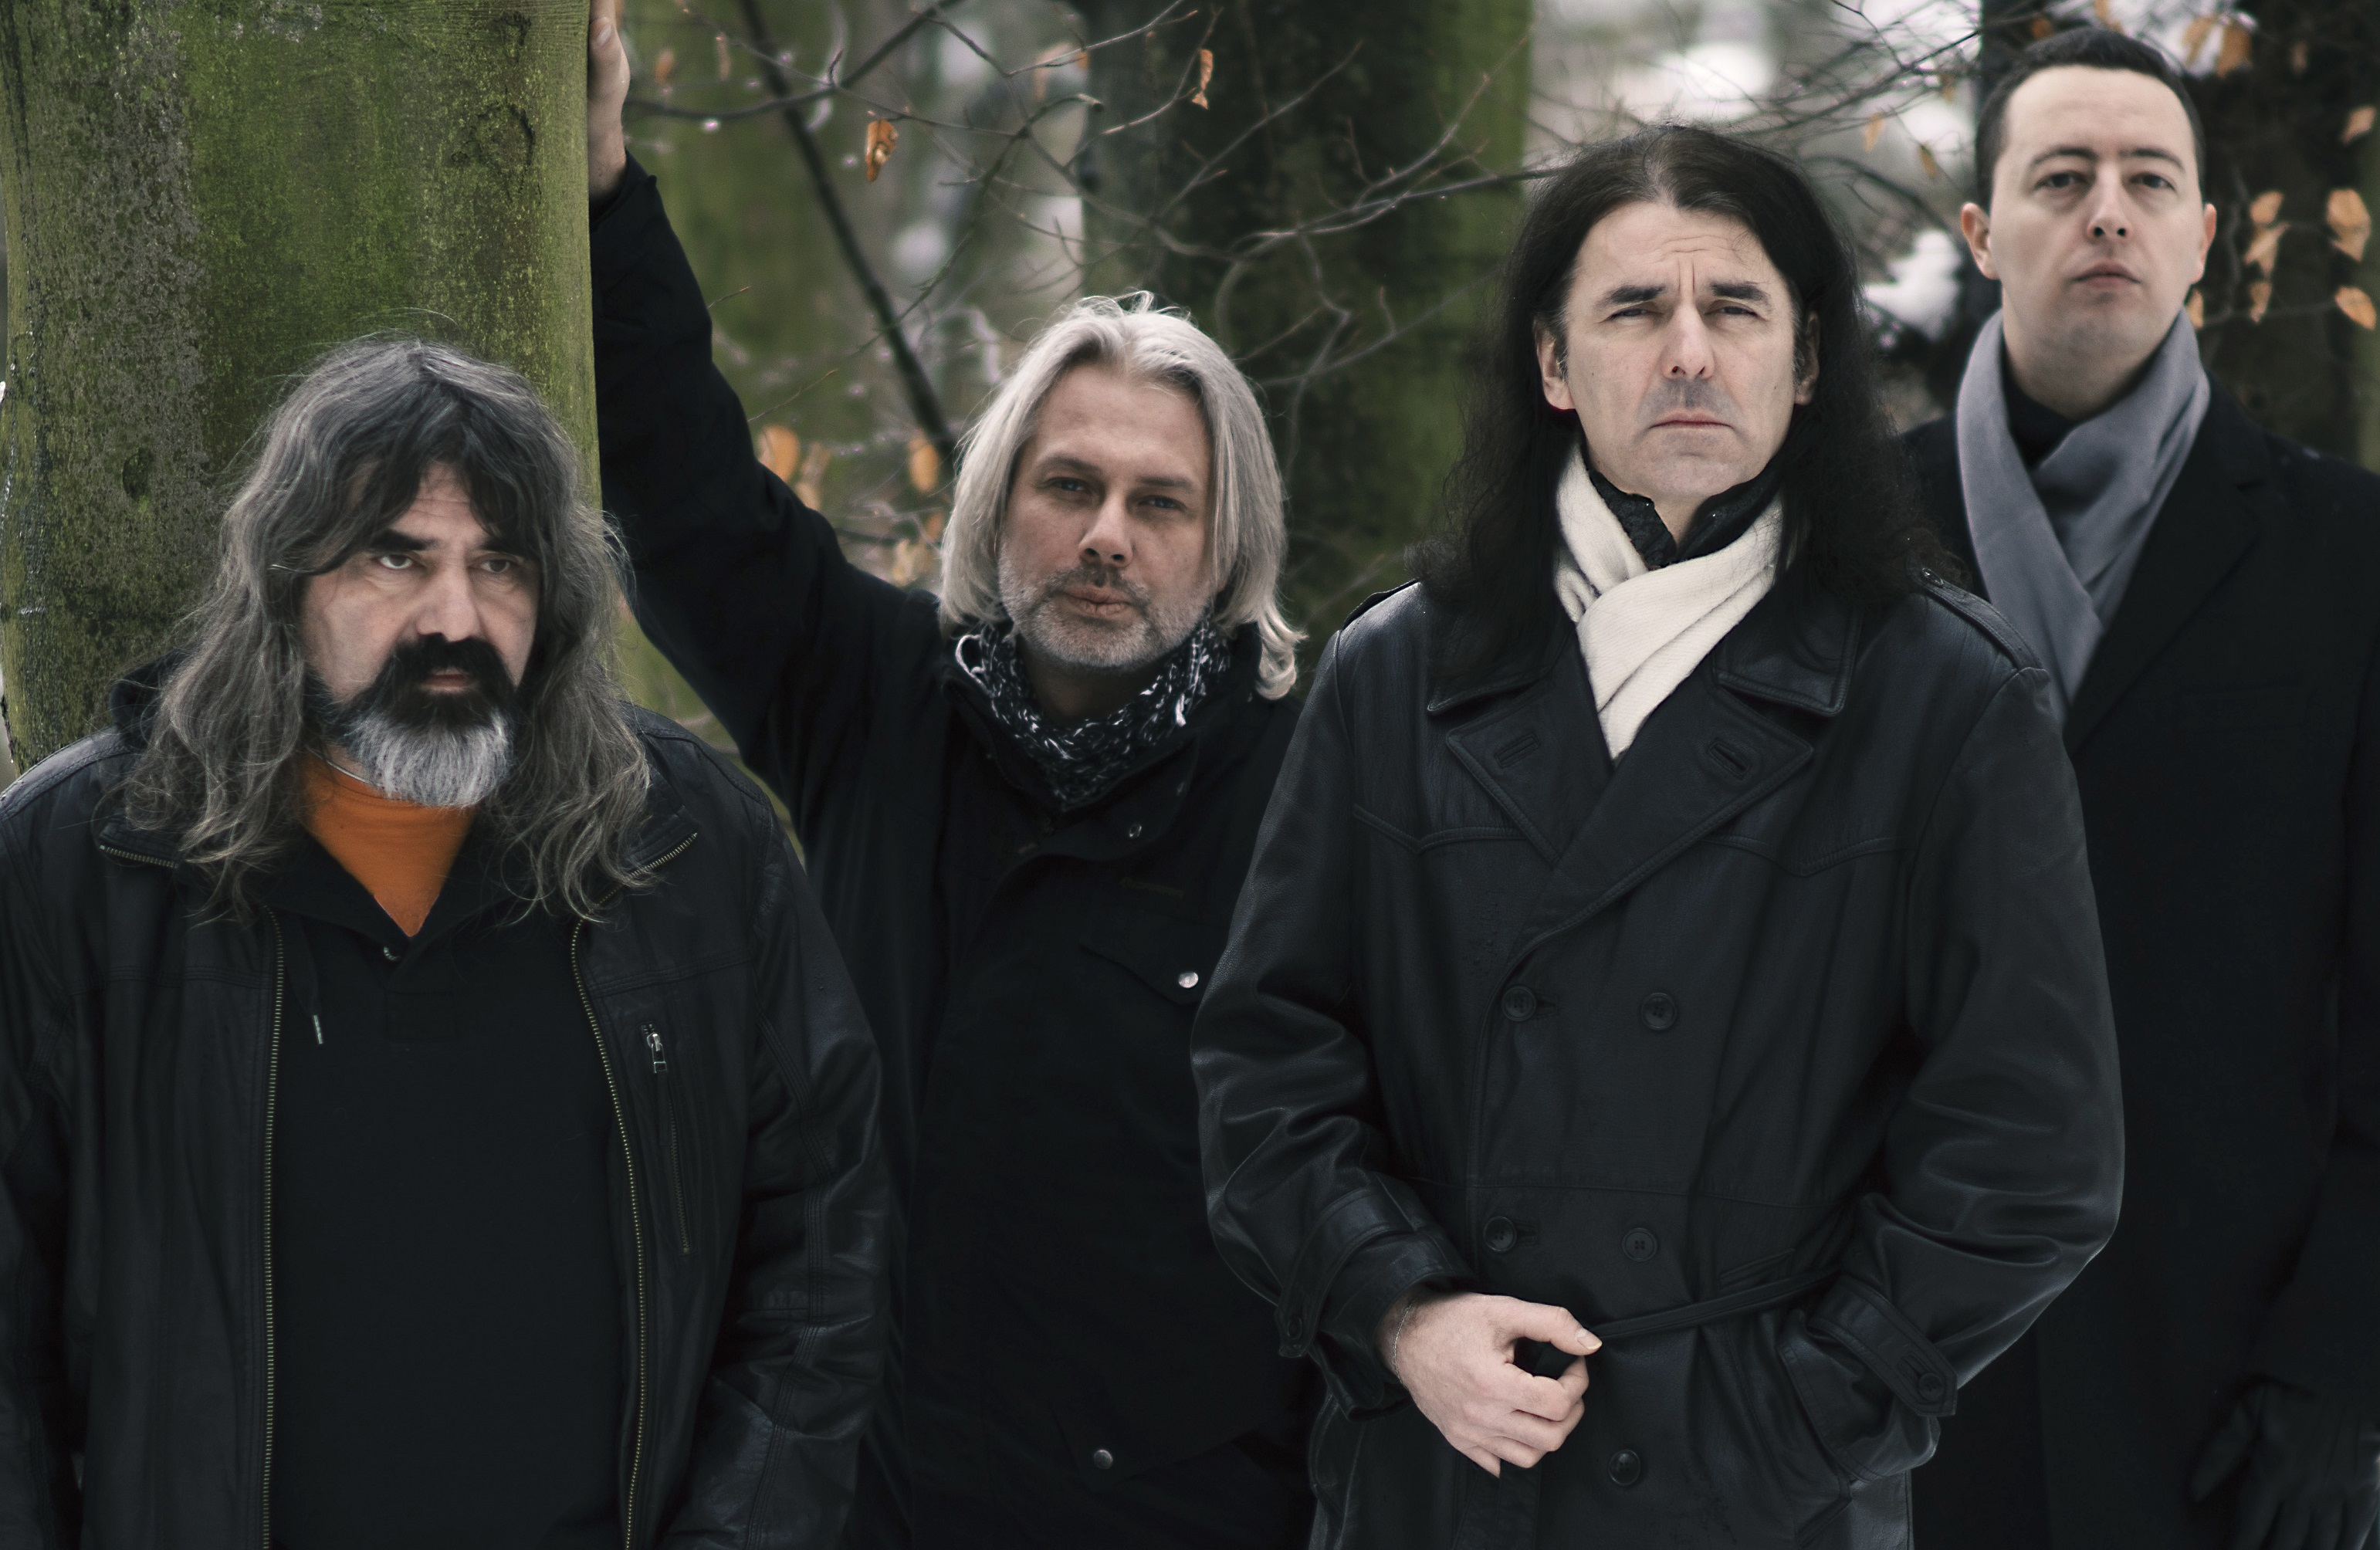 Kapela Nasycen vydává CD Ráno!